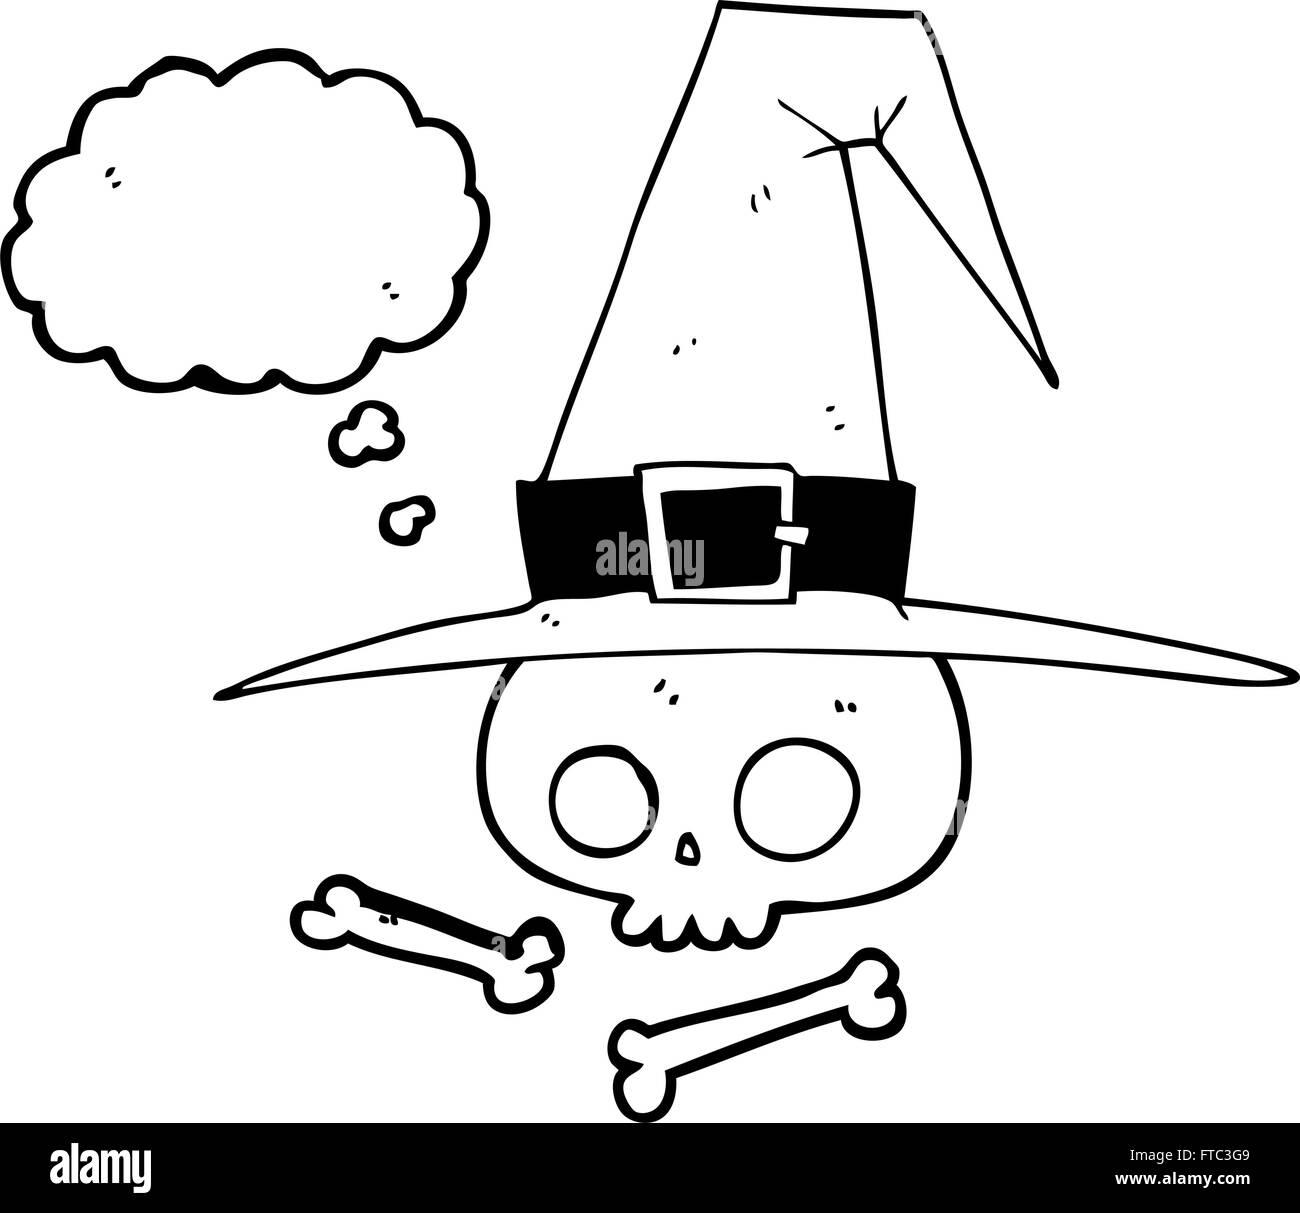 Pilgrim Hat Clipart Black And White Stock Photos Images Alamy